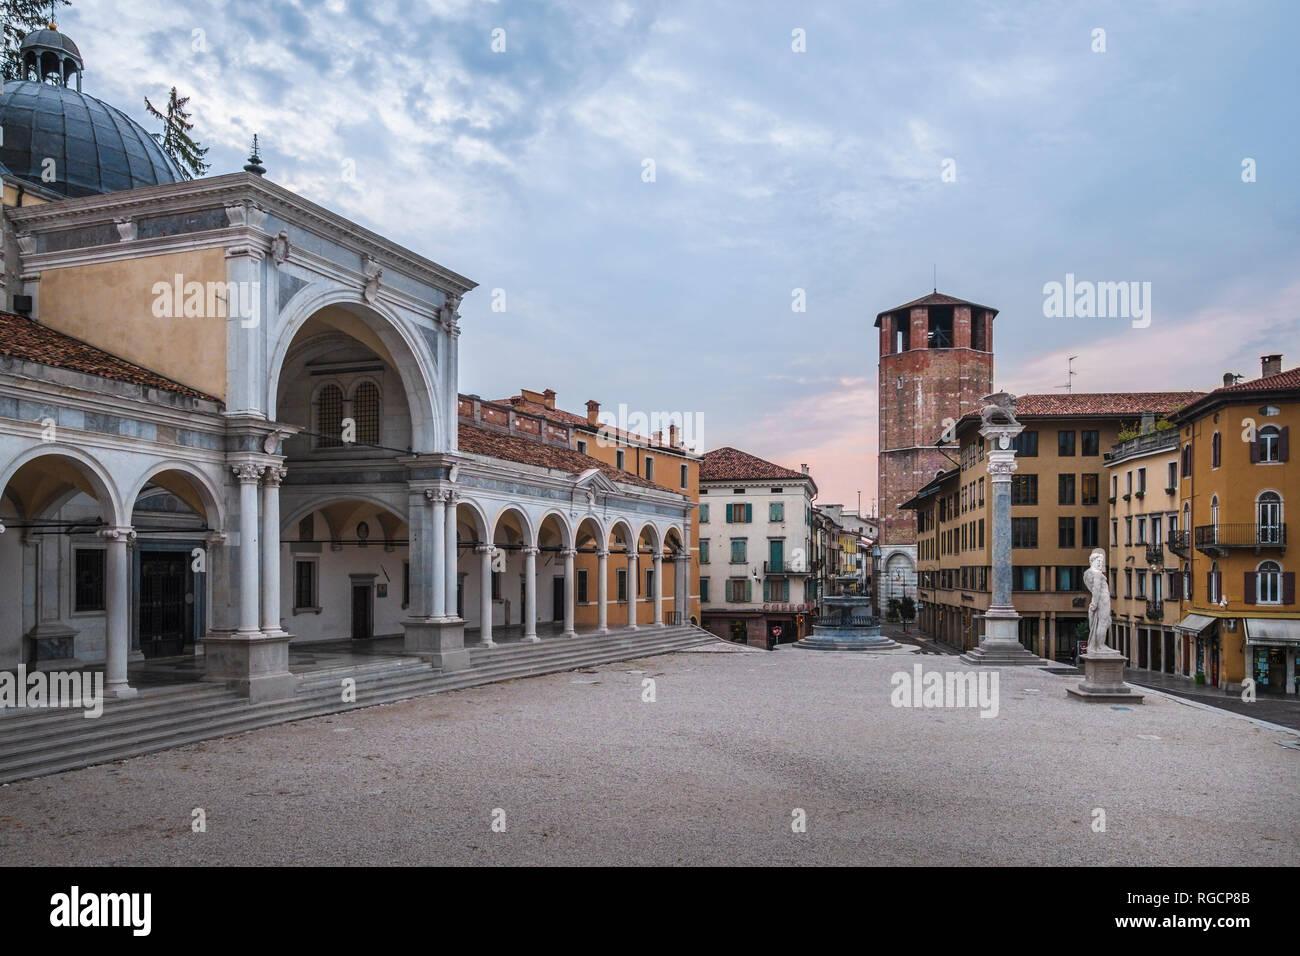 Italy, Friuli-Venezia Giulia, Udine, Piazza Liberta and Loggia di San Giovanni at dusk - Stock Image